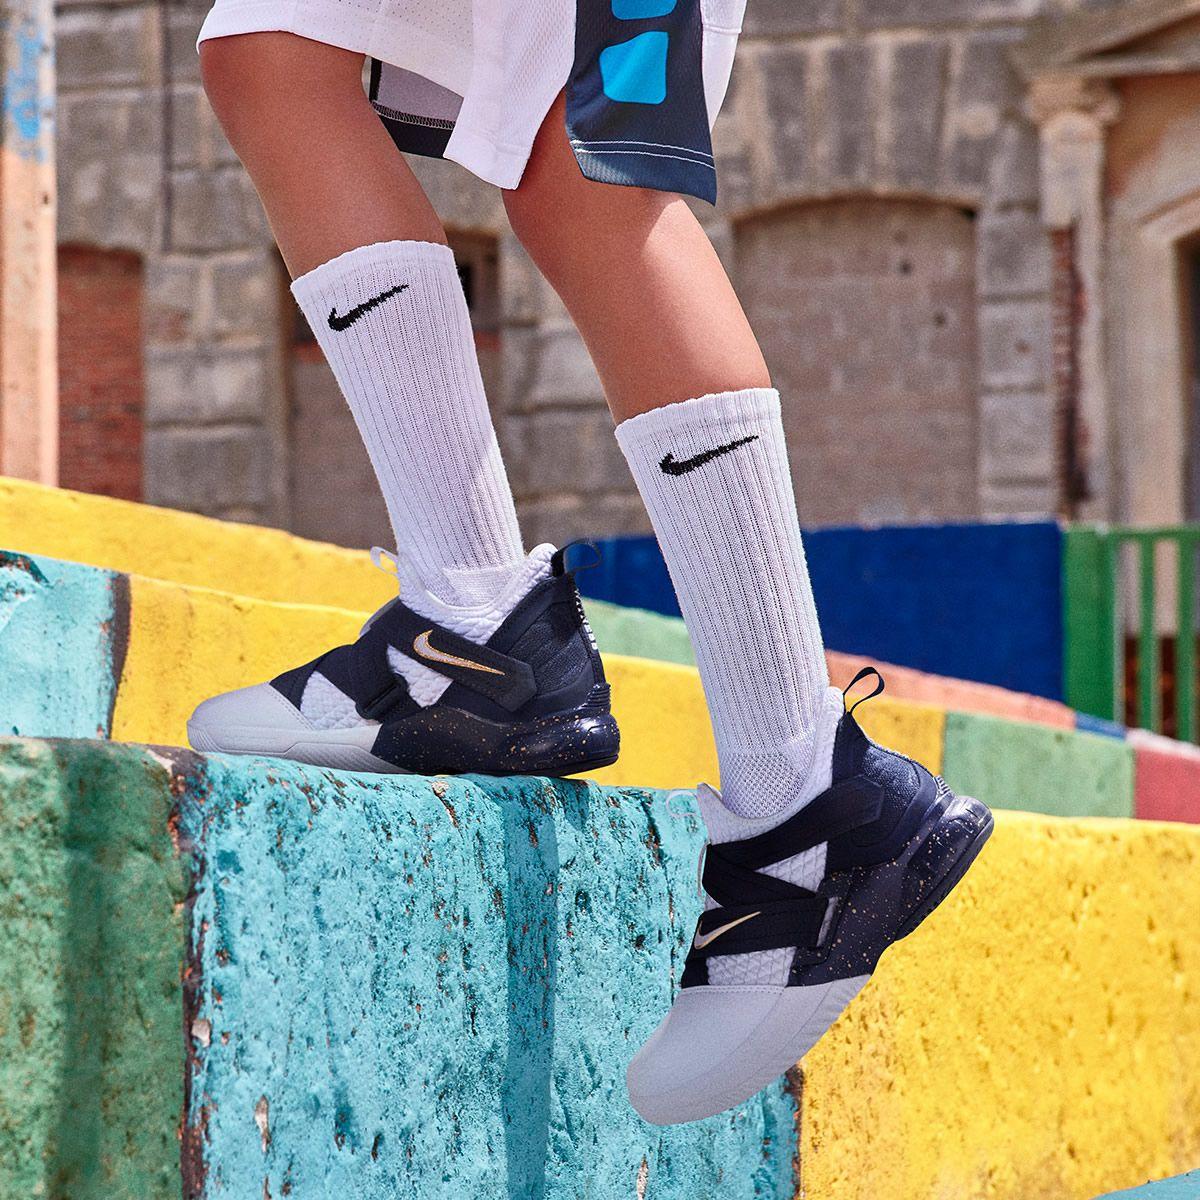 18a415382db Nike Kids Clothes - Kids Nike Clothing - Macy s